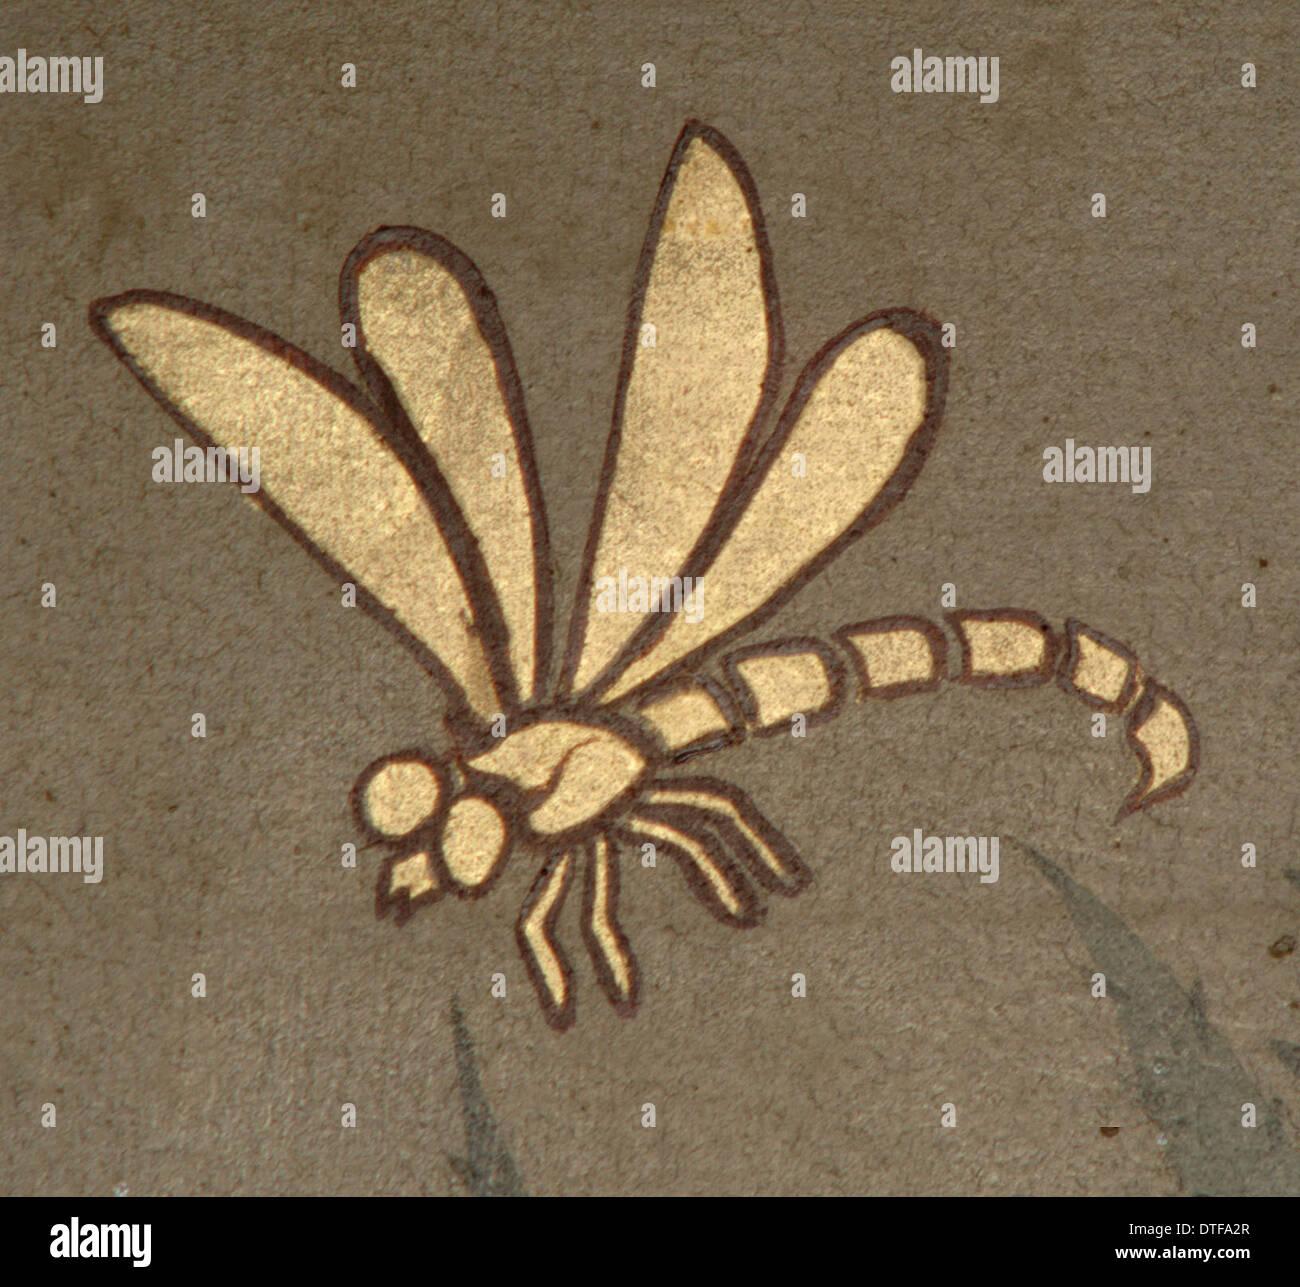 Dragonfly de paneles de techo decorativos Imagen De Stock